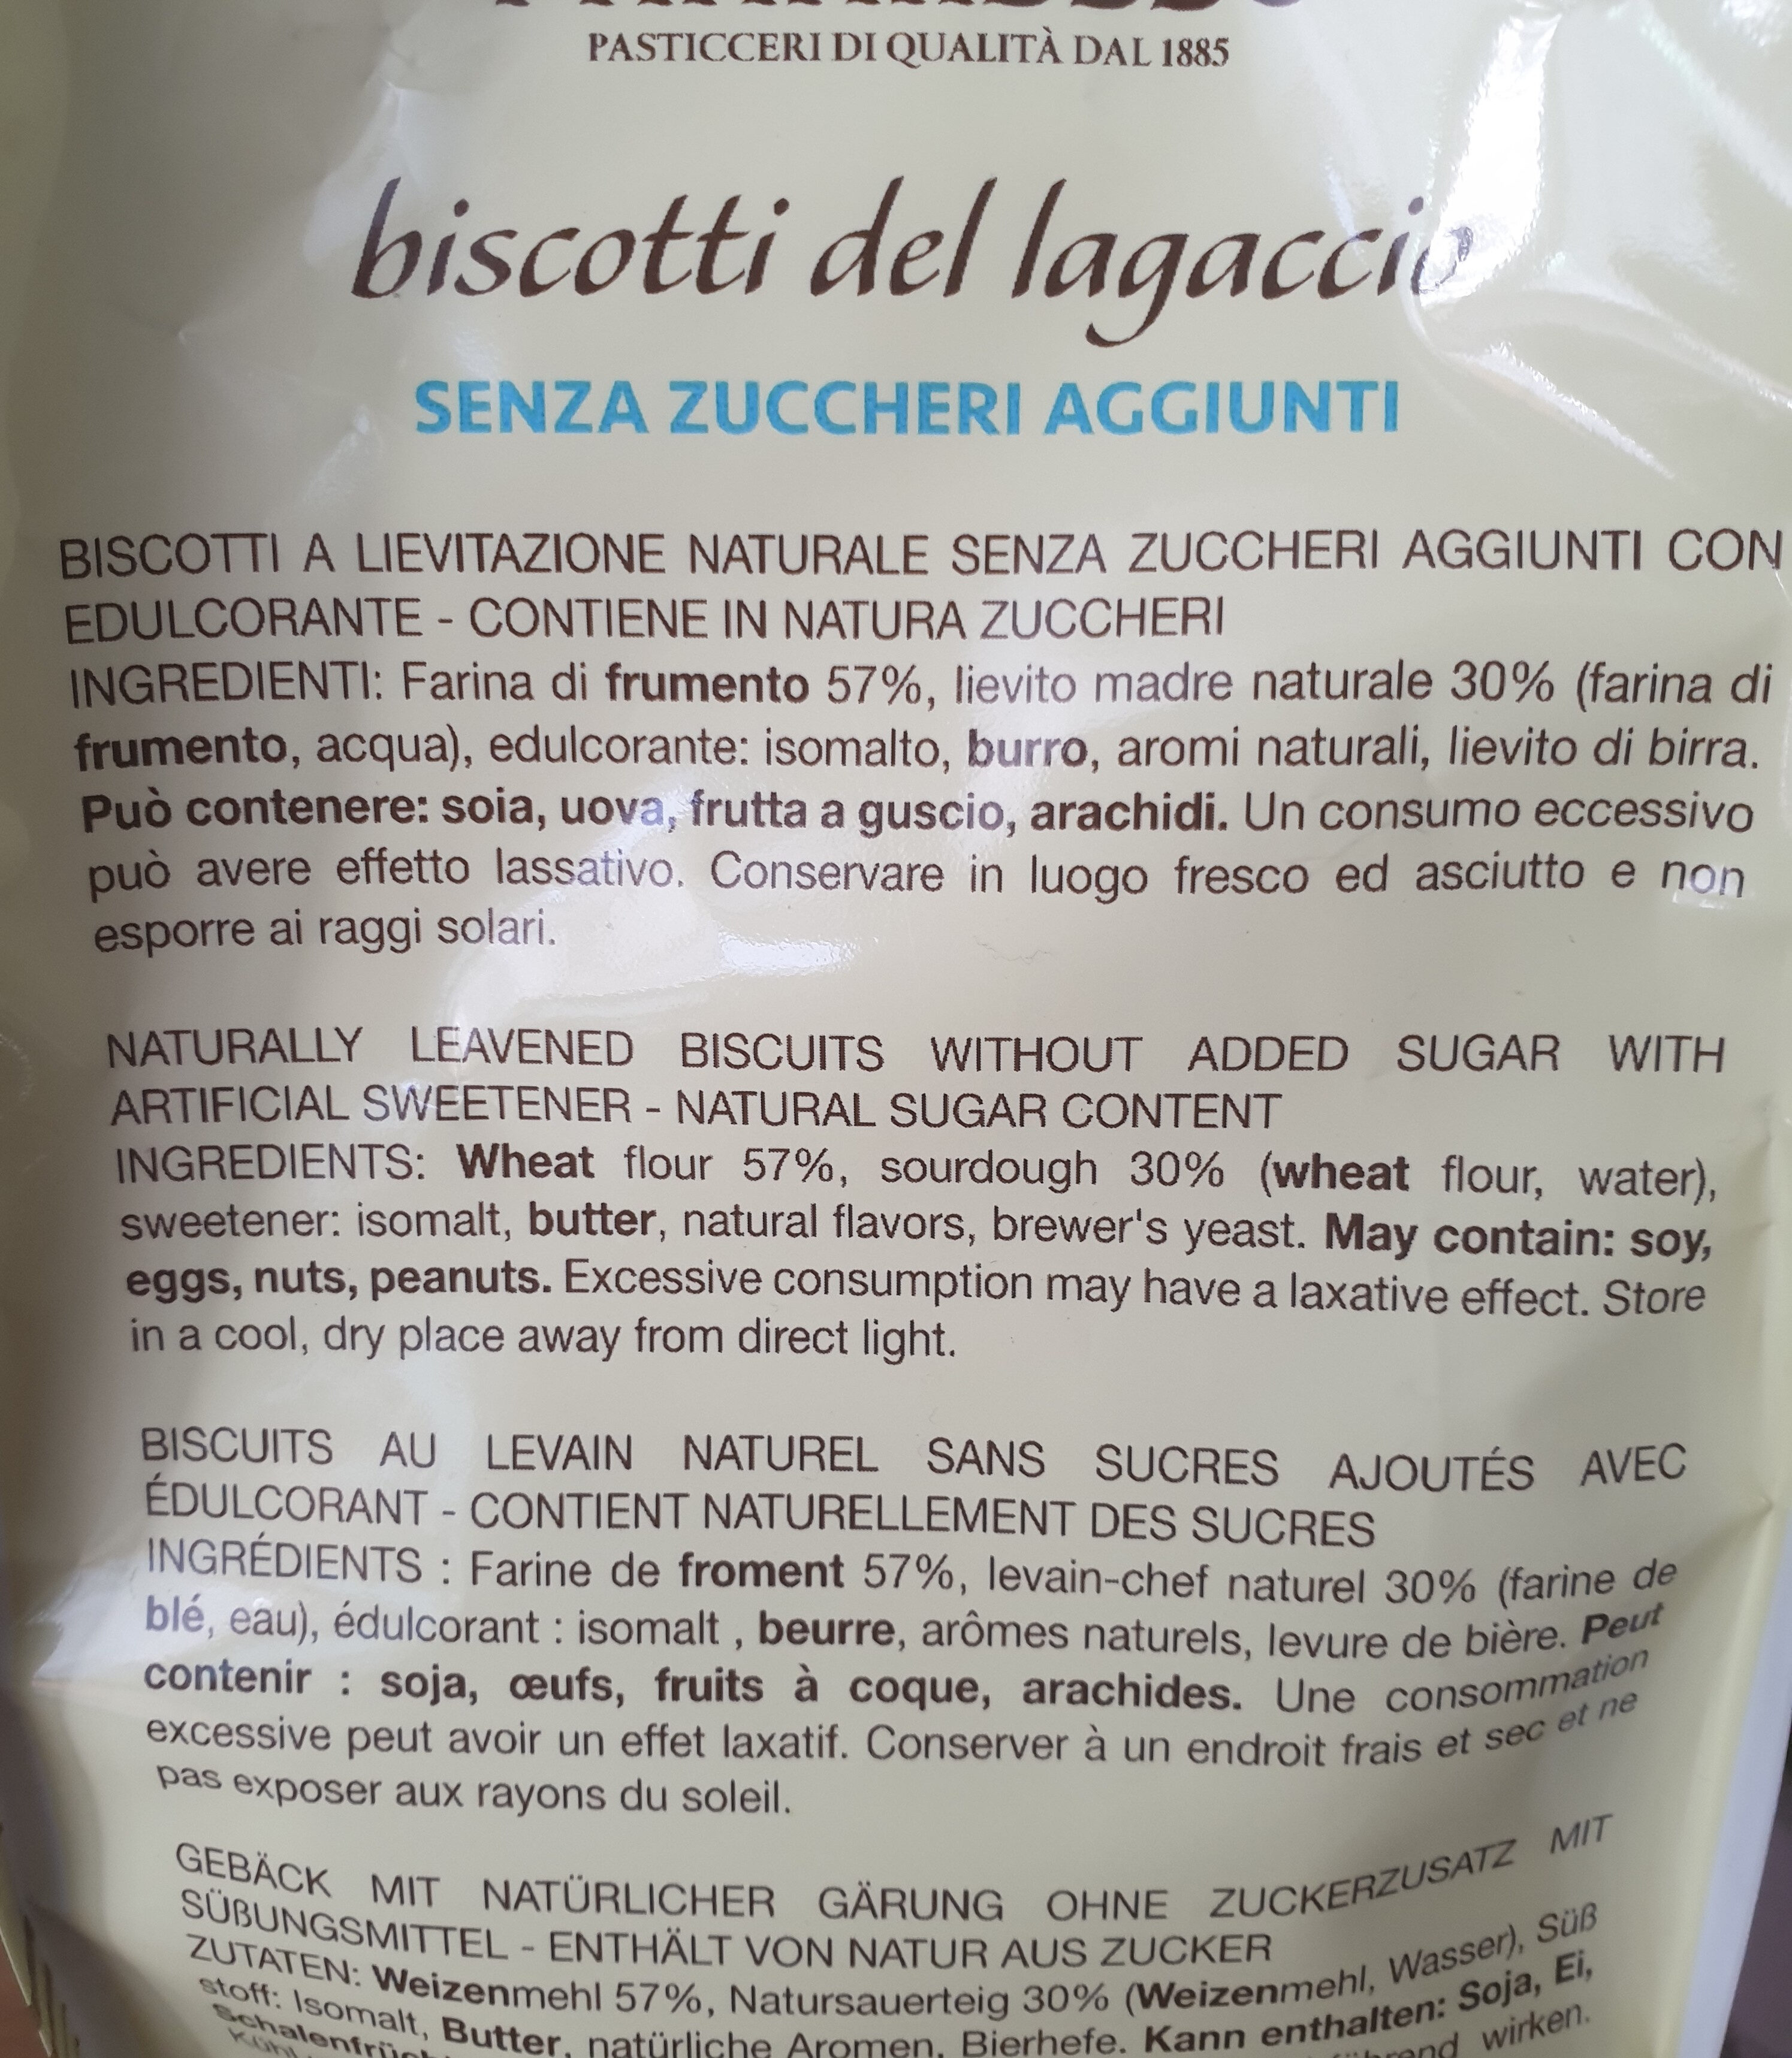 biscotti lagaccio - Ingredients